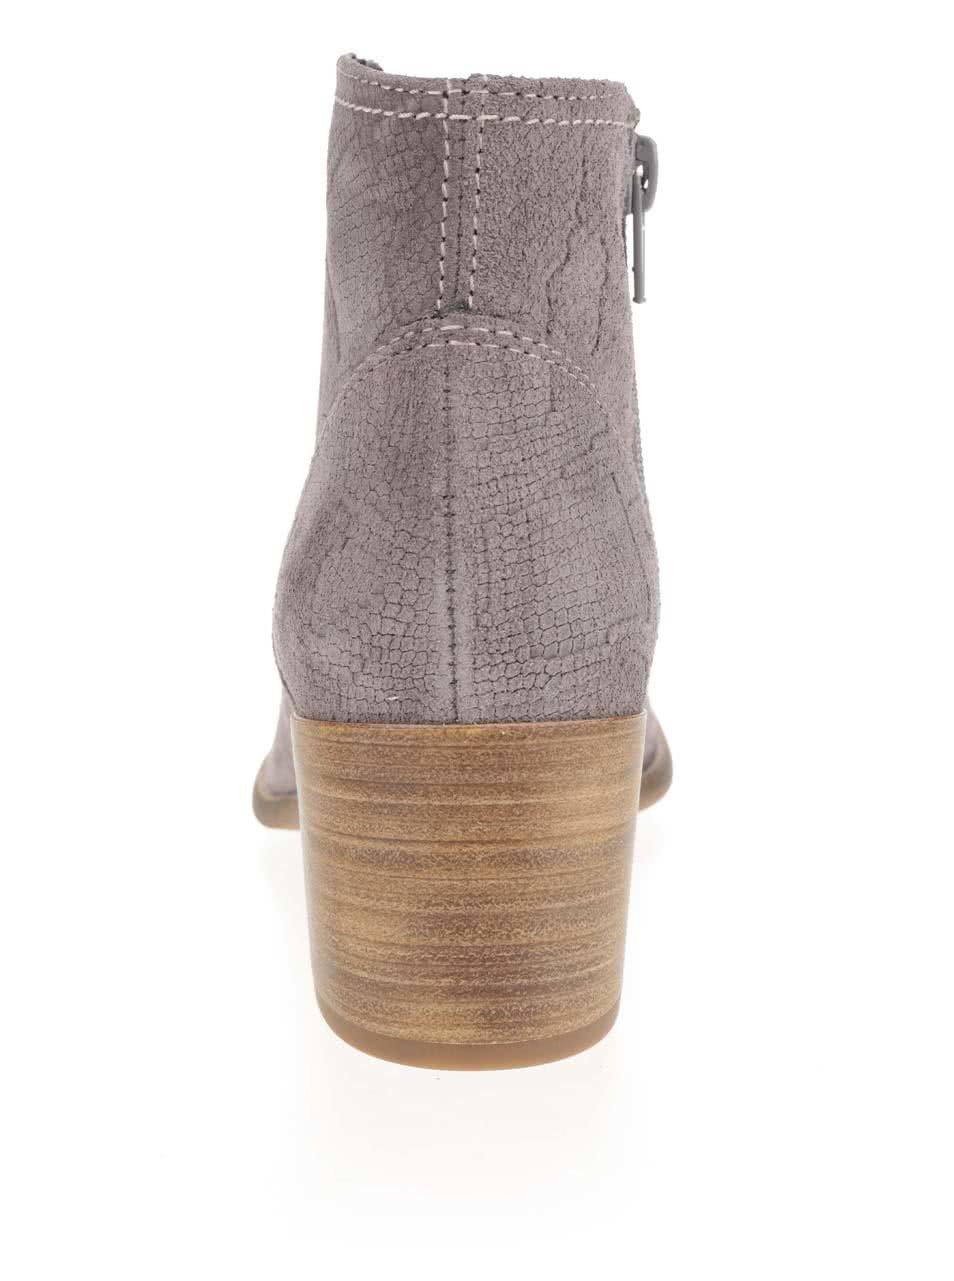 d9368b0fe176d Sivé semišové vzorované členkové topánky na podpätku Tamaris | ZOOT.sk